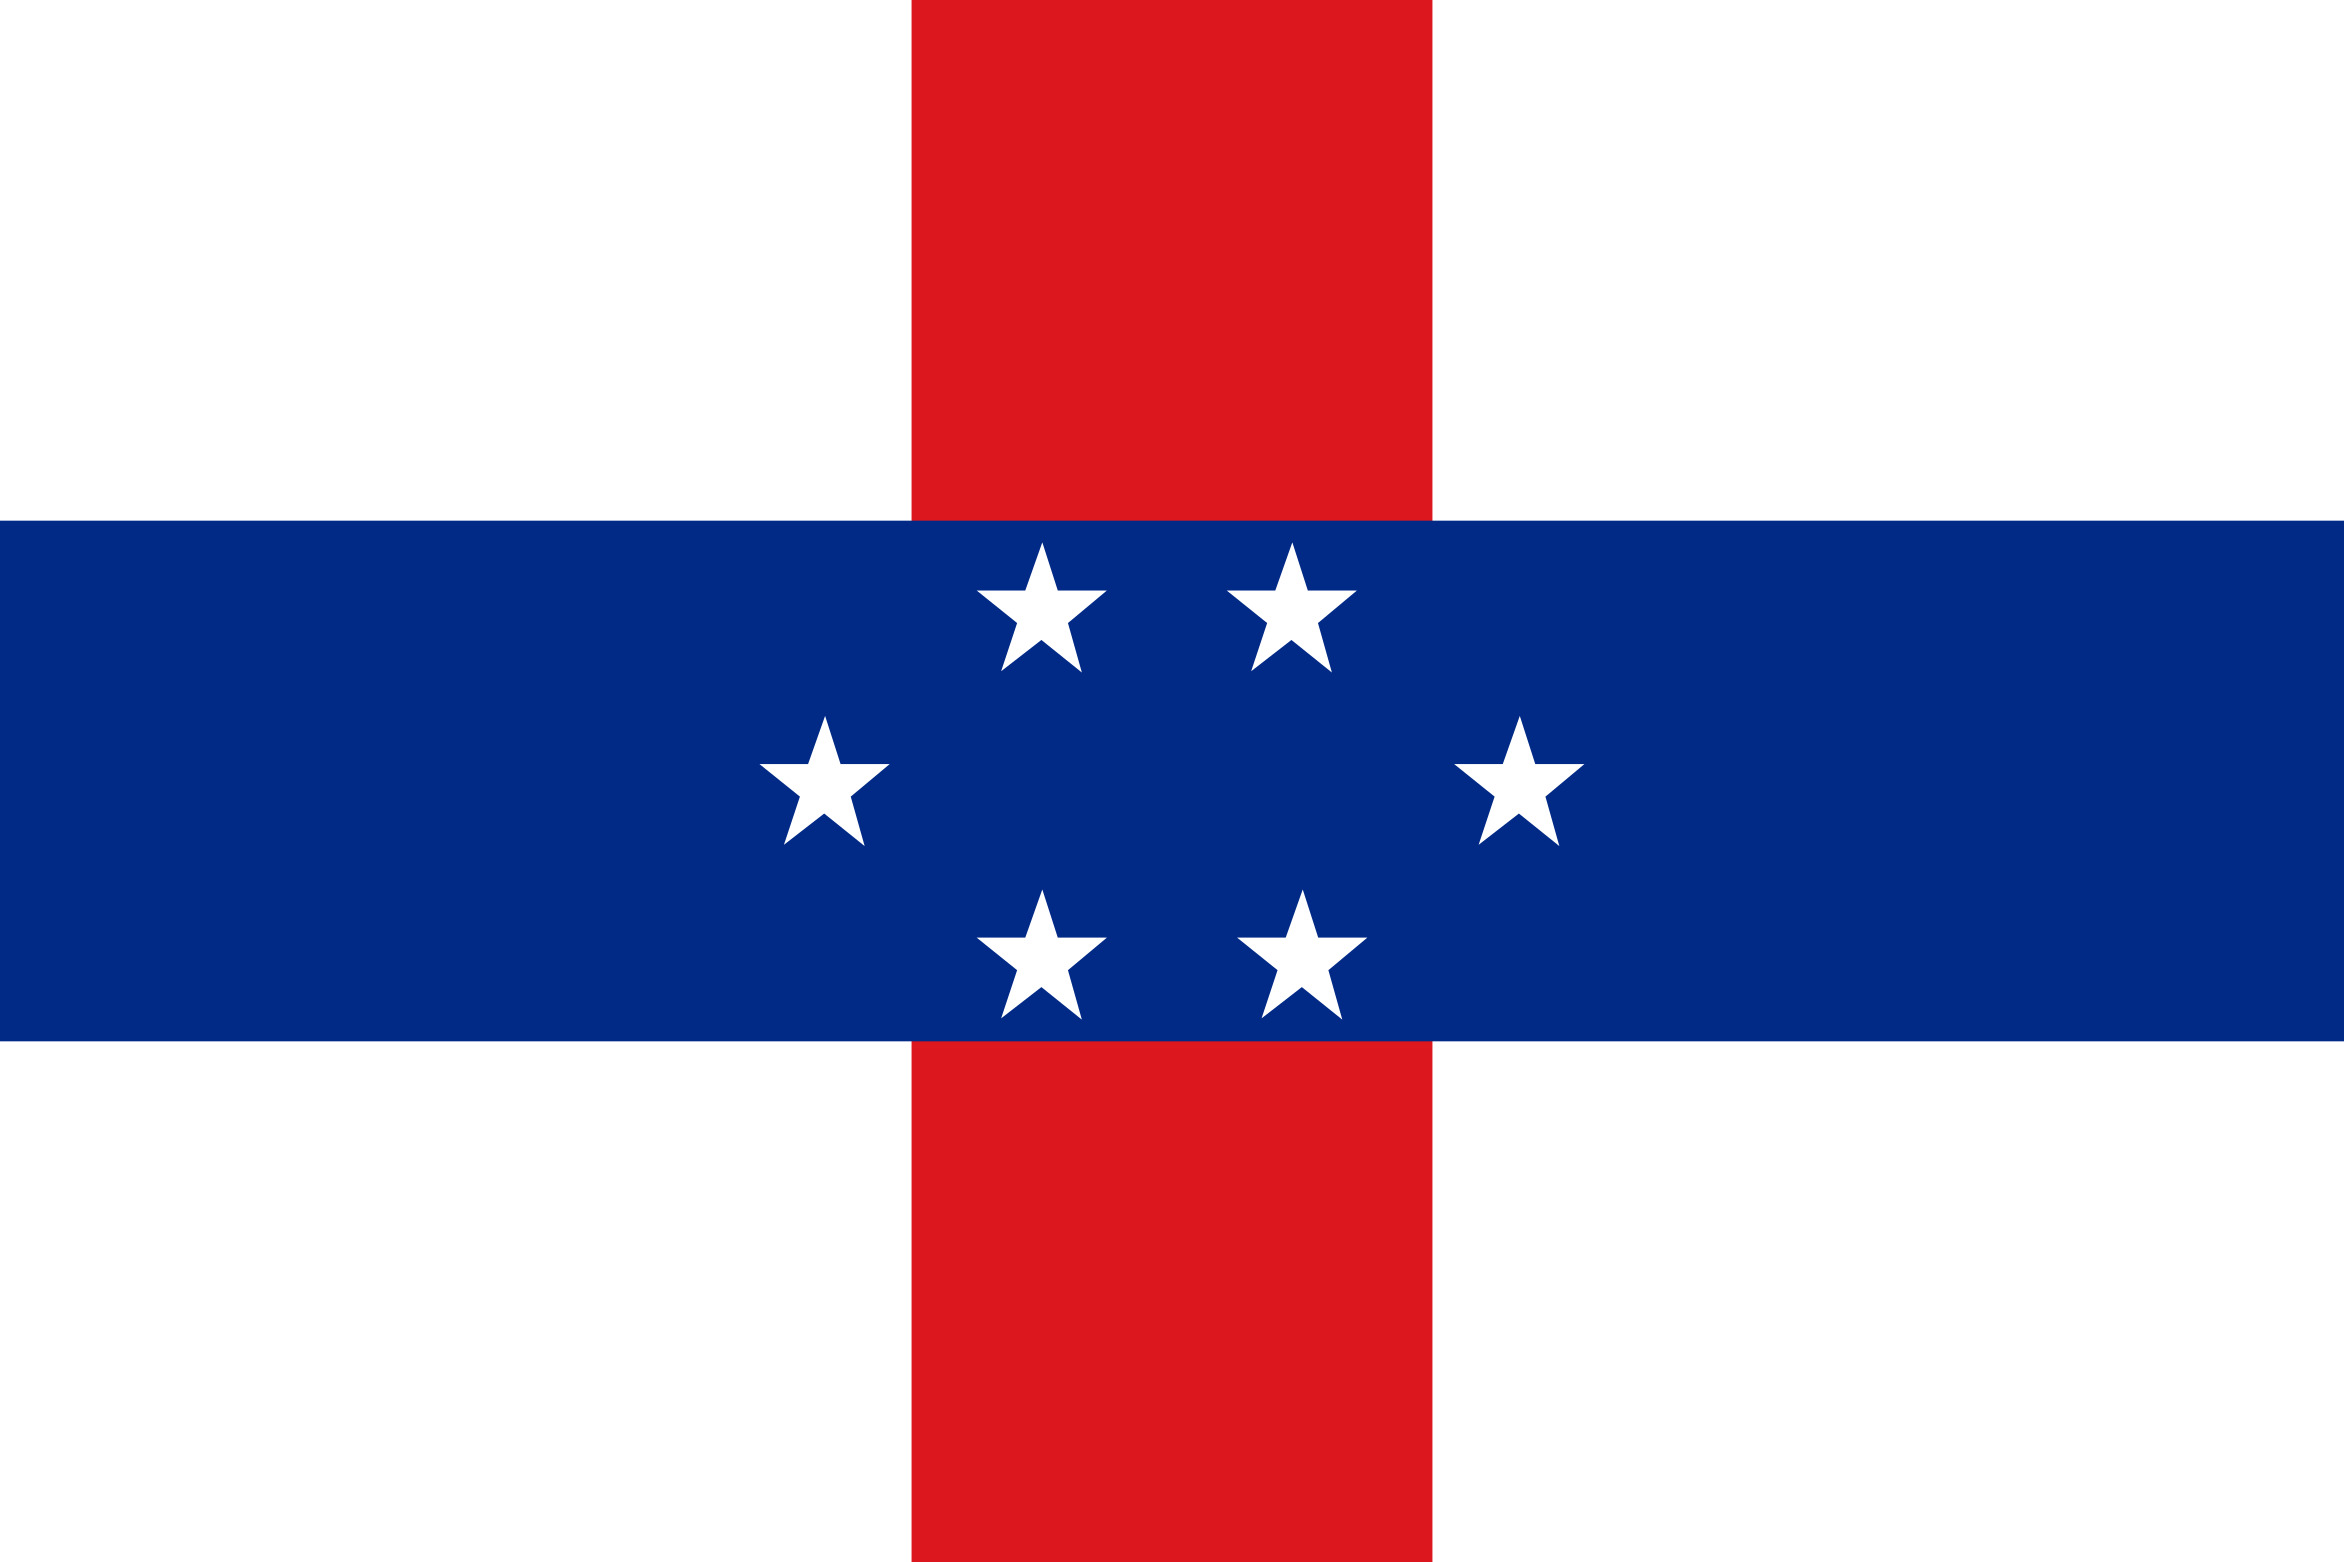 Netherlands_Antilles Flag Colours